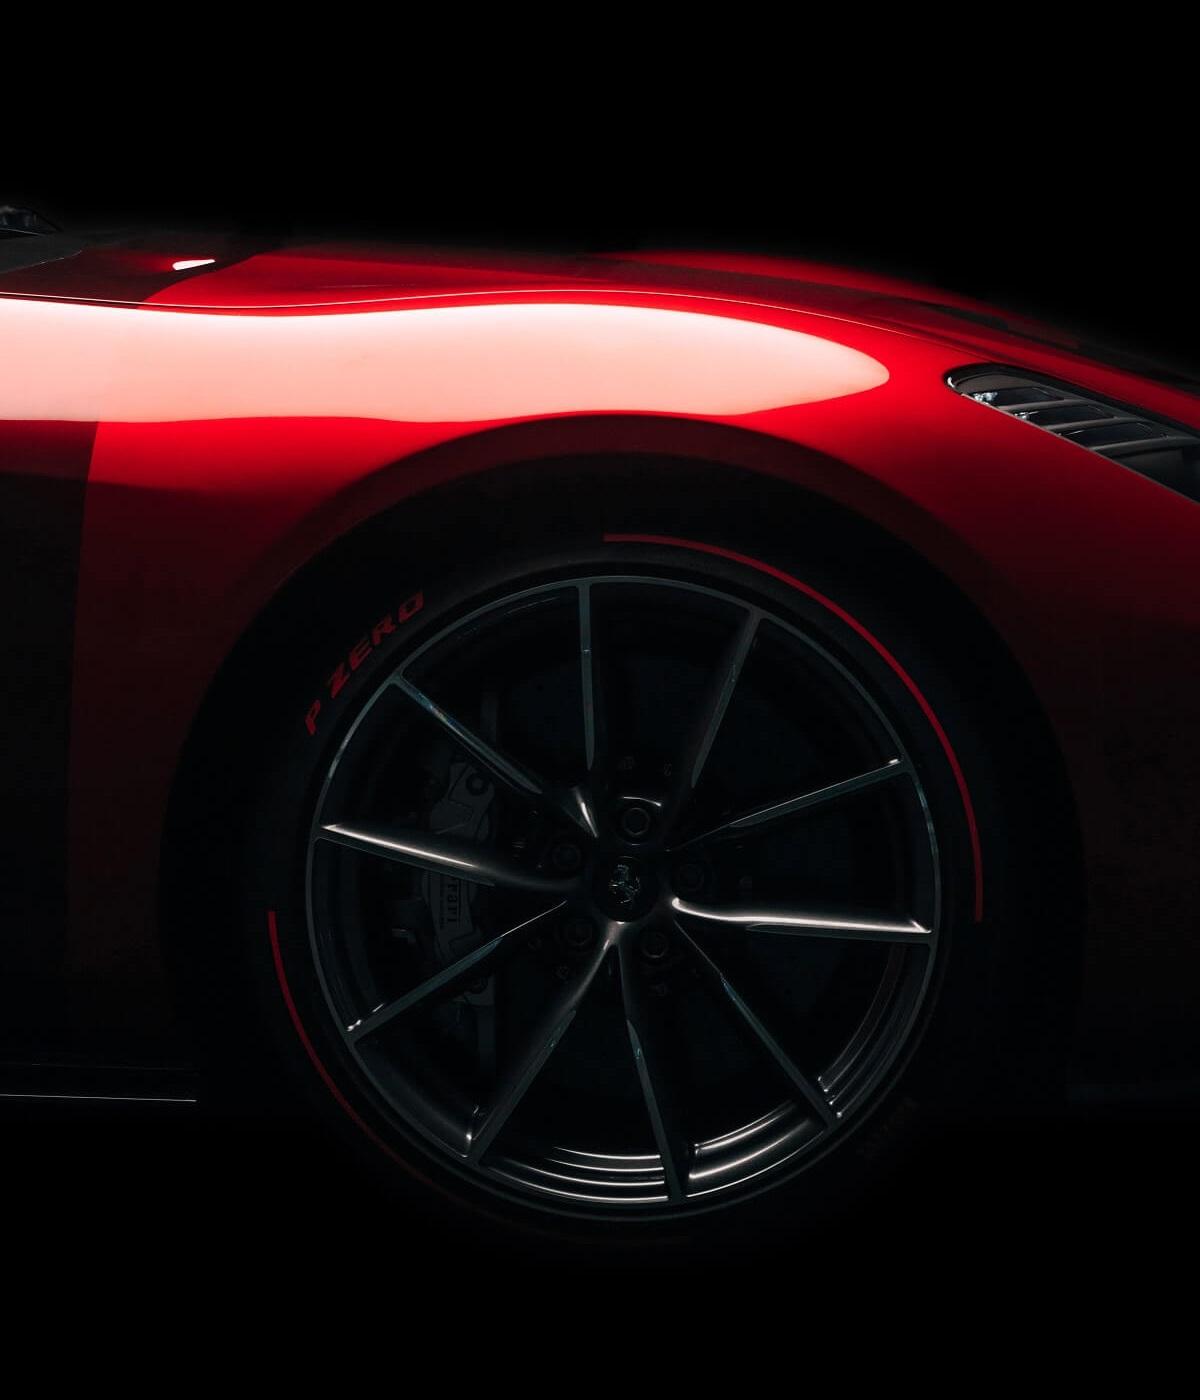 07_Ferrari_Omologata_f_wing_detail.jpg